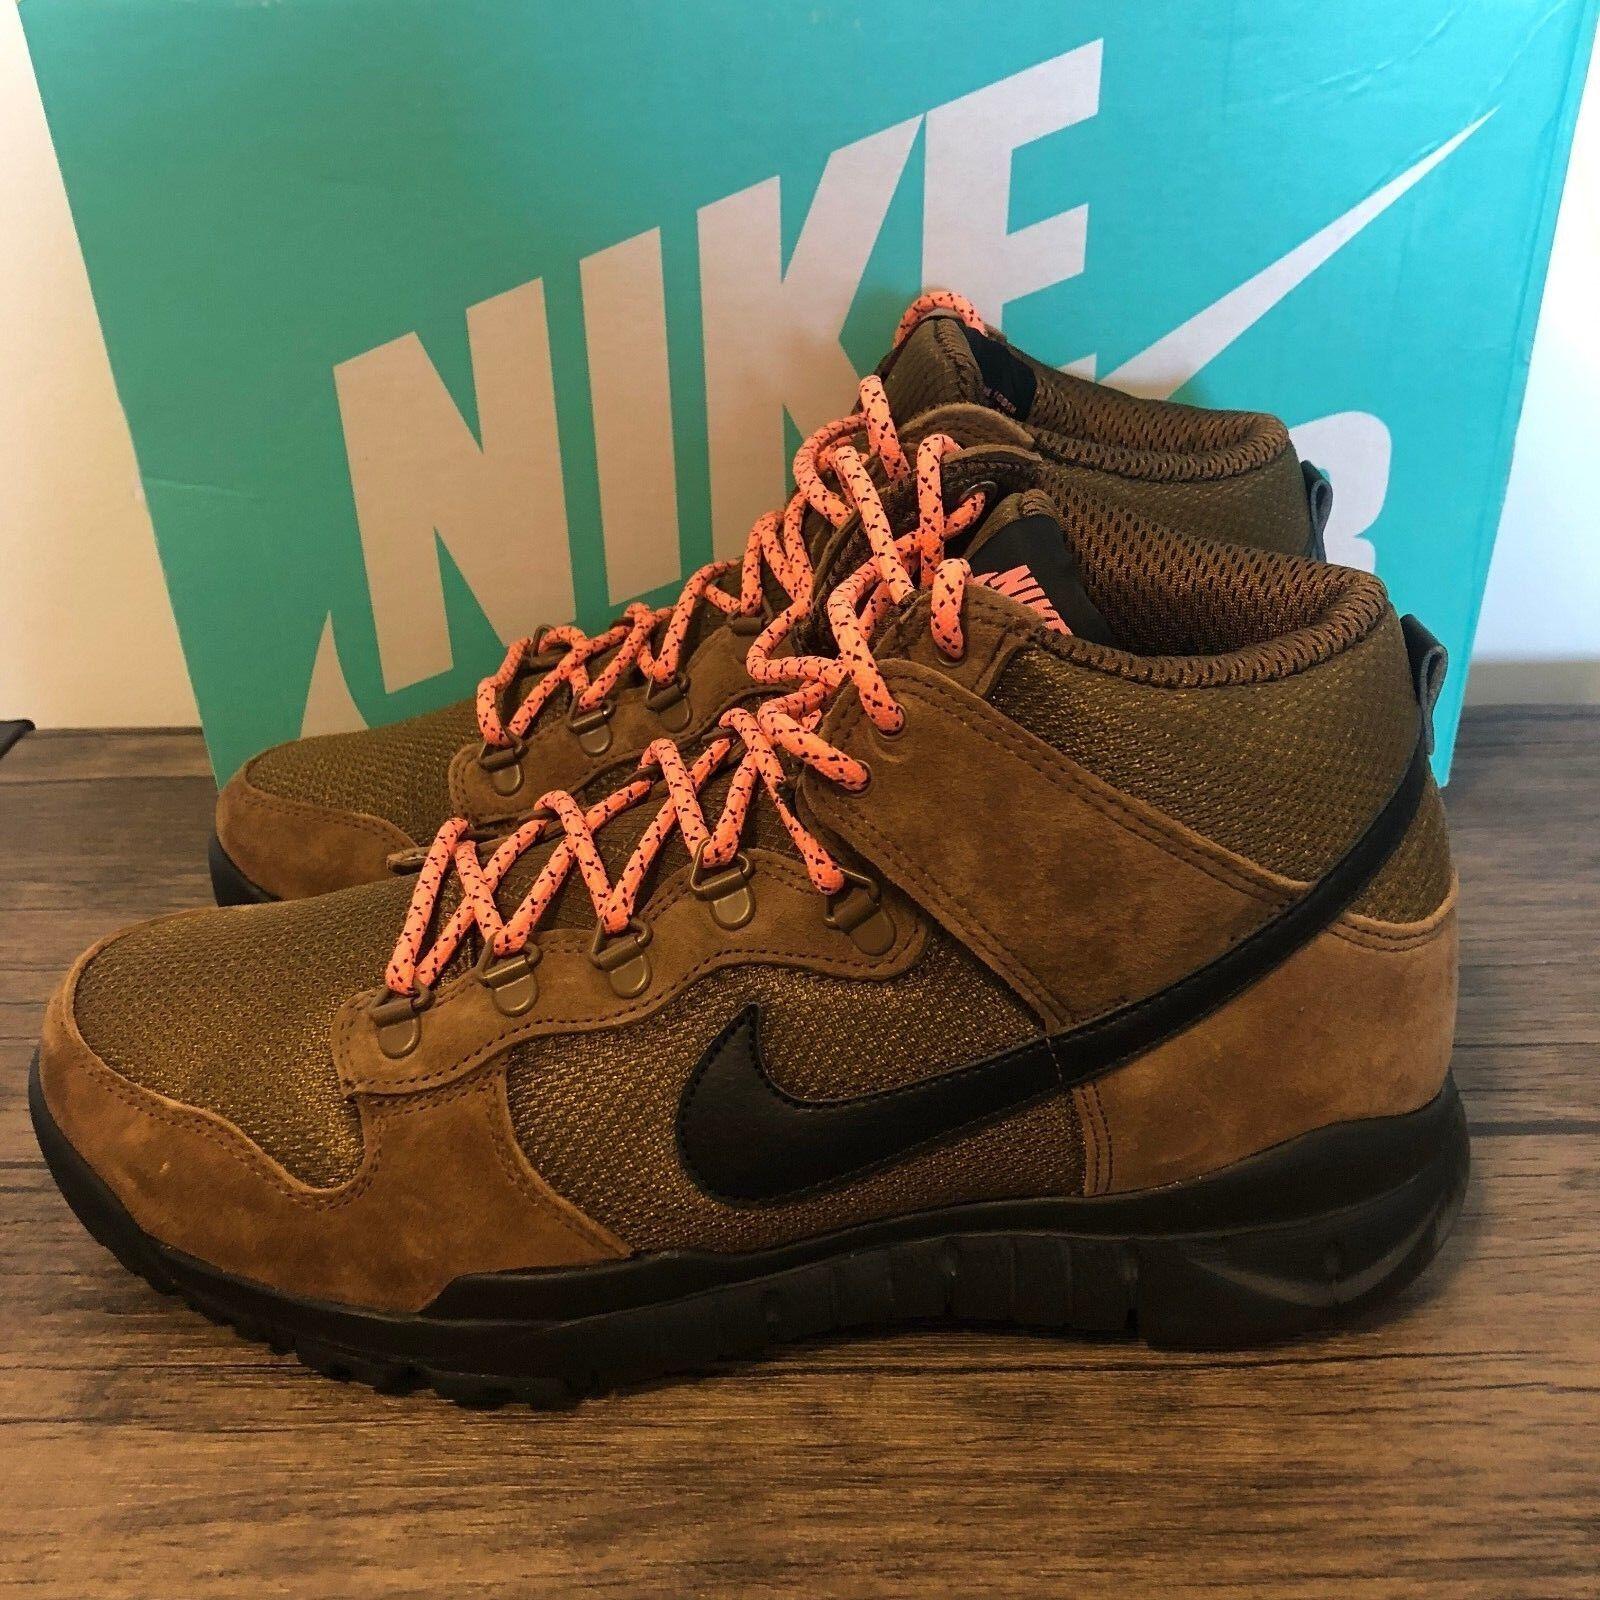 Economics Nike Air Max 90 EZ Cool Grey Volt Anthracite Dk Grey White AO1745 003 Men's Sportswear Running Shoes AO1745 003